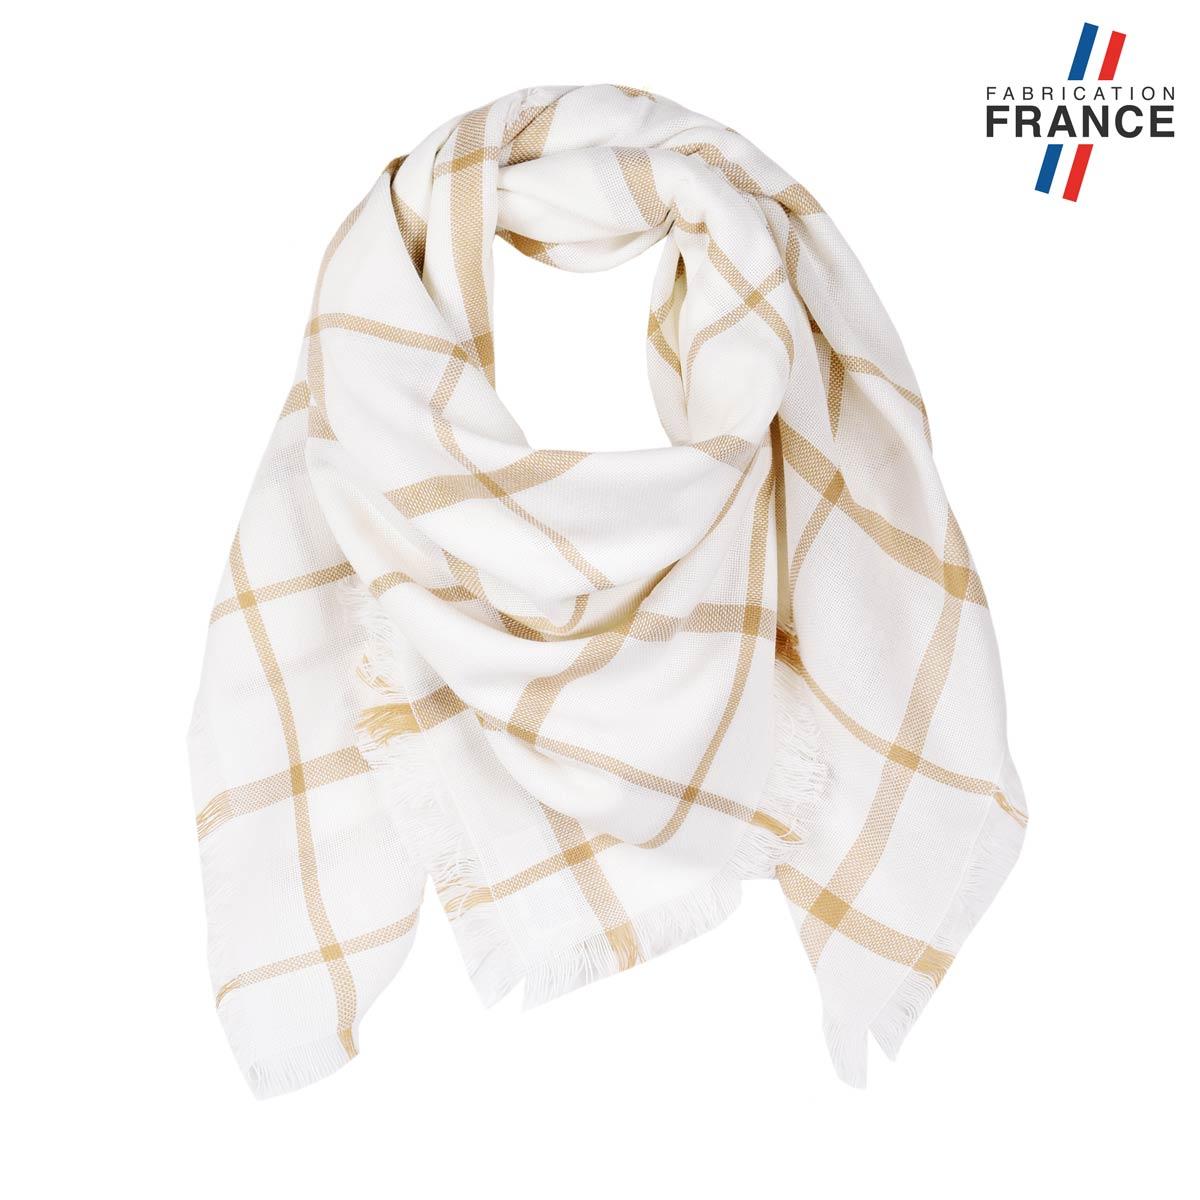 AT-05828_F12-1FR_Echarpe-carreaux-beige-made-in-france